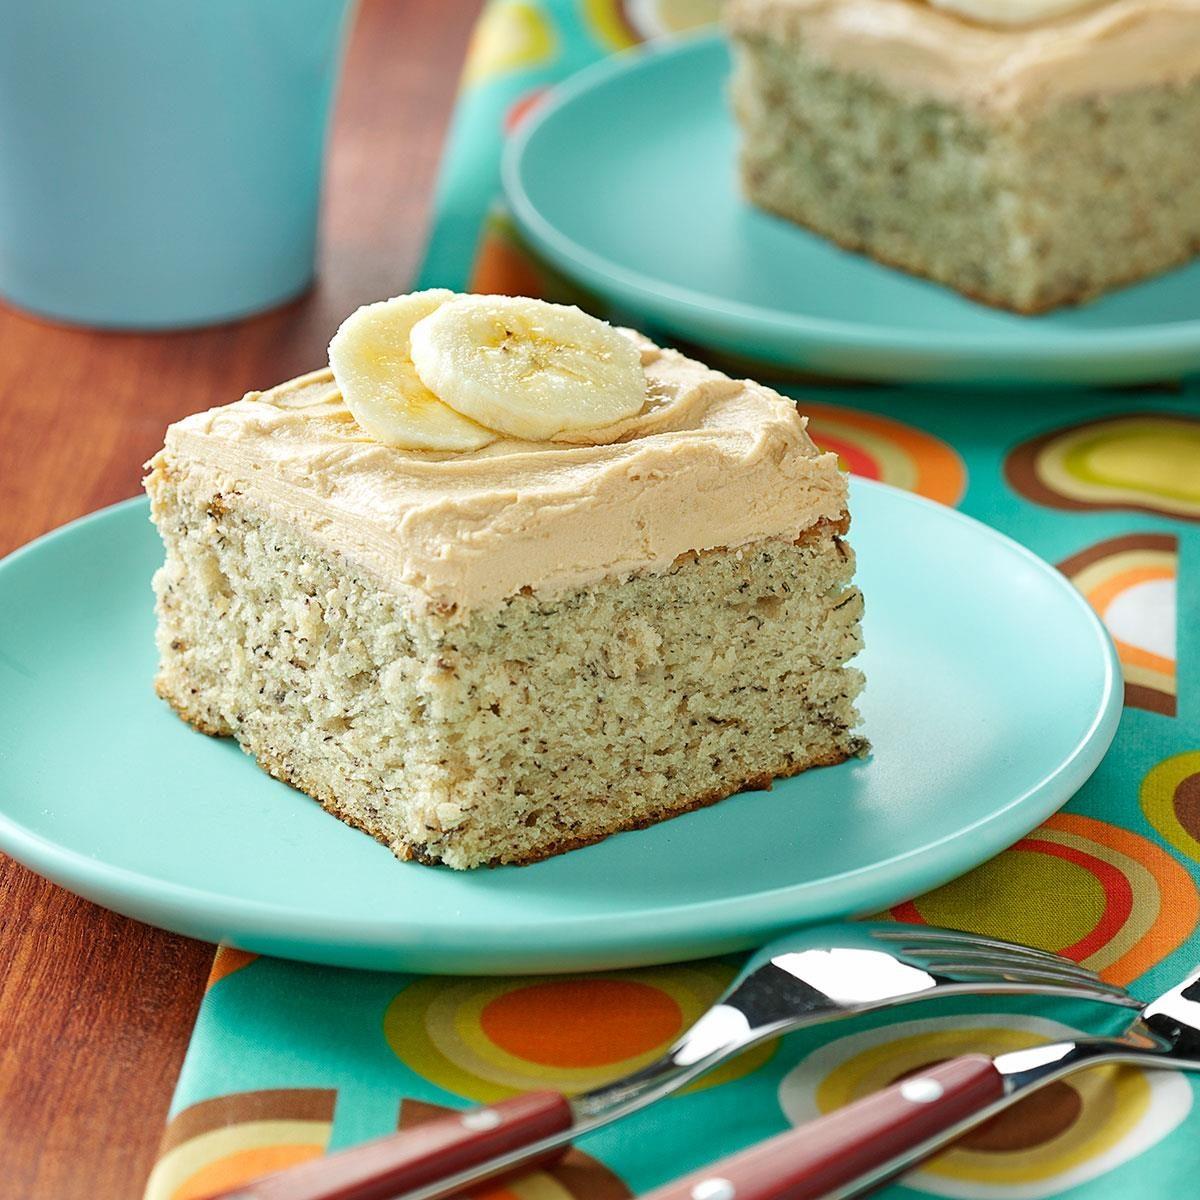 Easy Banana Cake Recipe Using Cake Flour